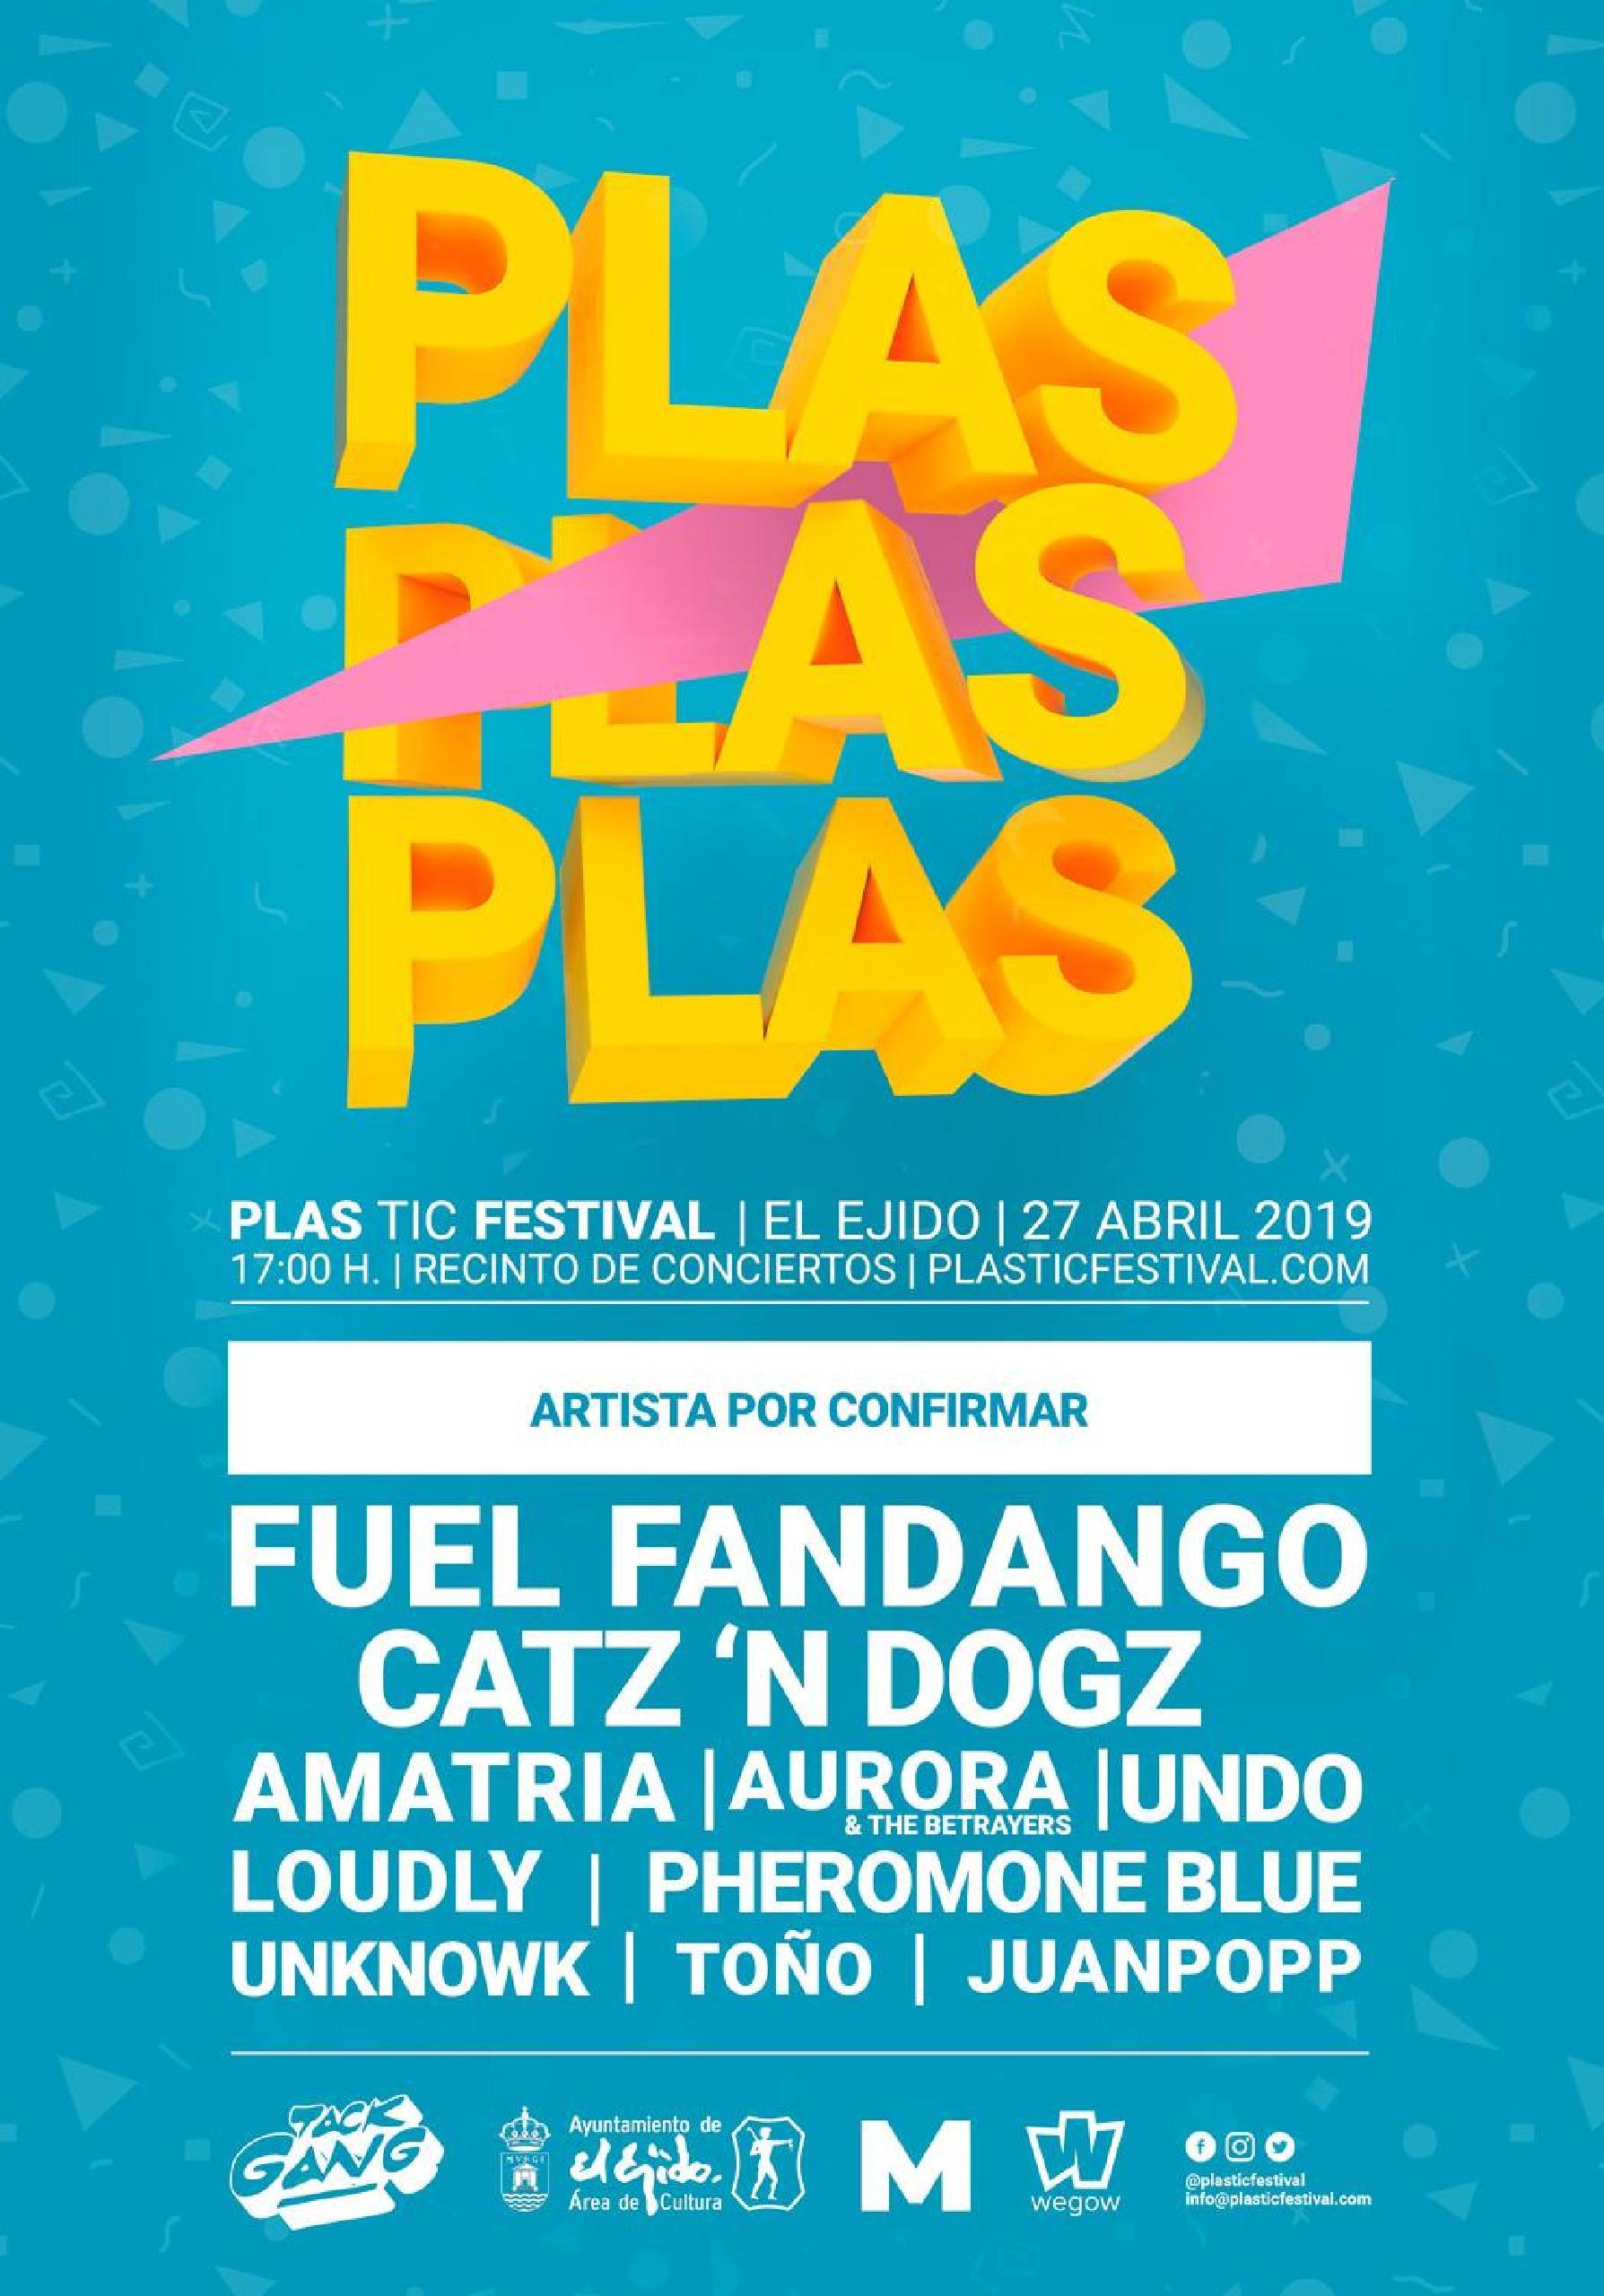 Primeras confirmaciones Plastic Festival 2019